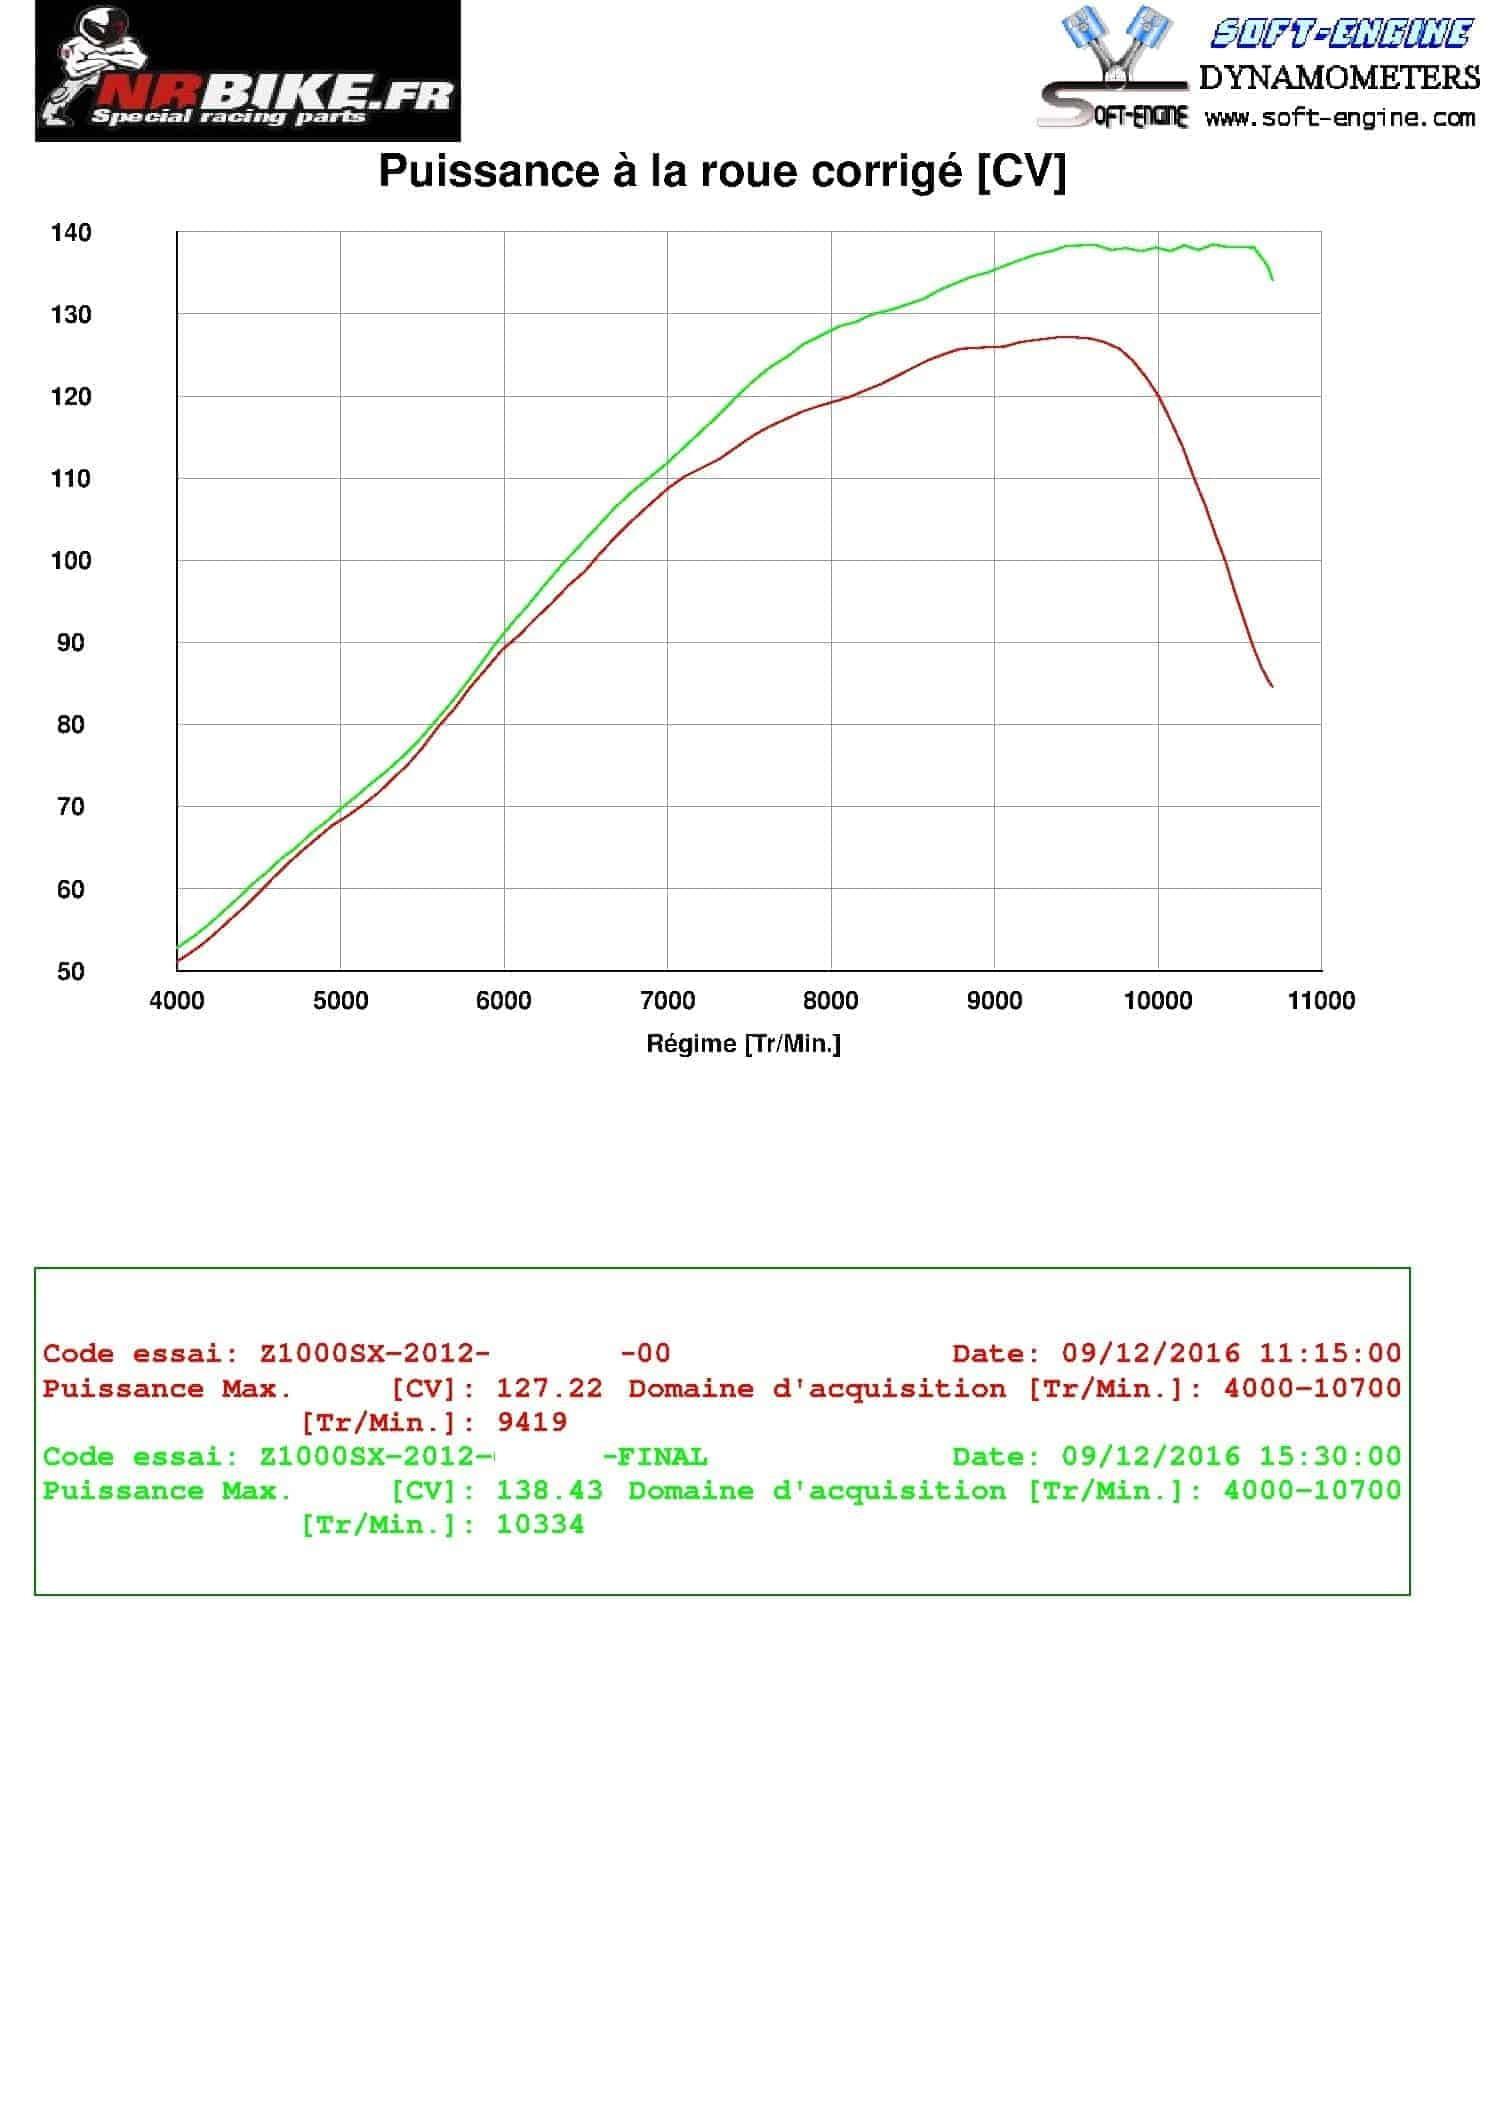 Reprogrammation boitier ECU KAWASAKI Z1000 SX de 2011 à 2013